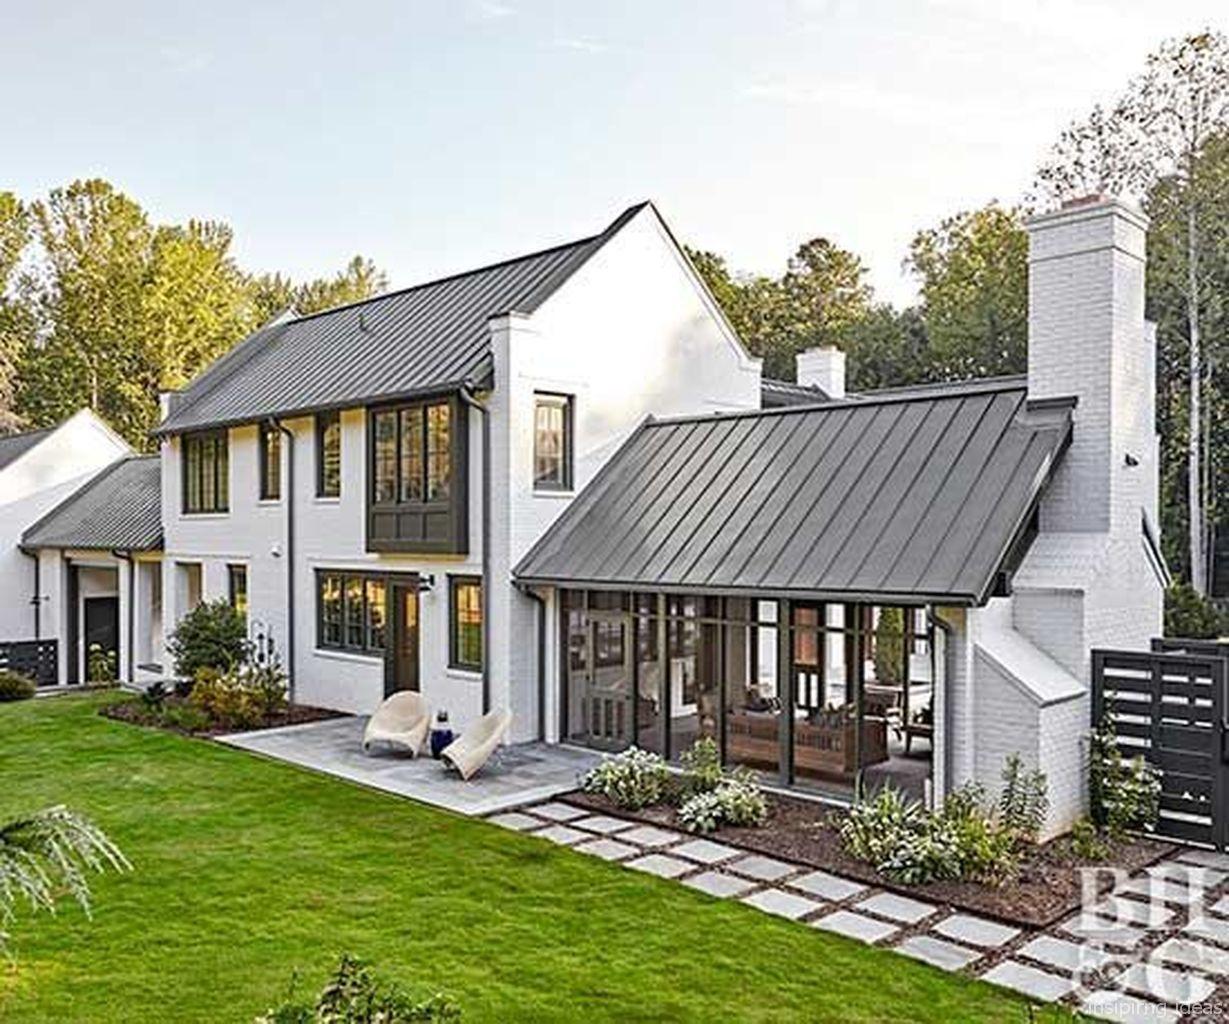 Simple Modern Farmhouse Exterior Design Ideas 03 Modern